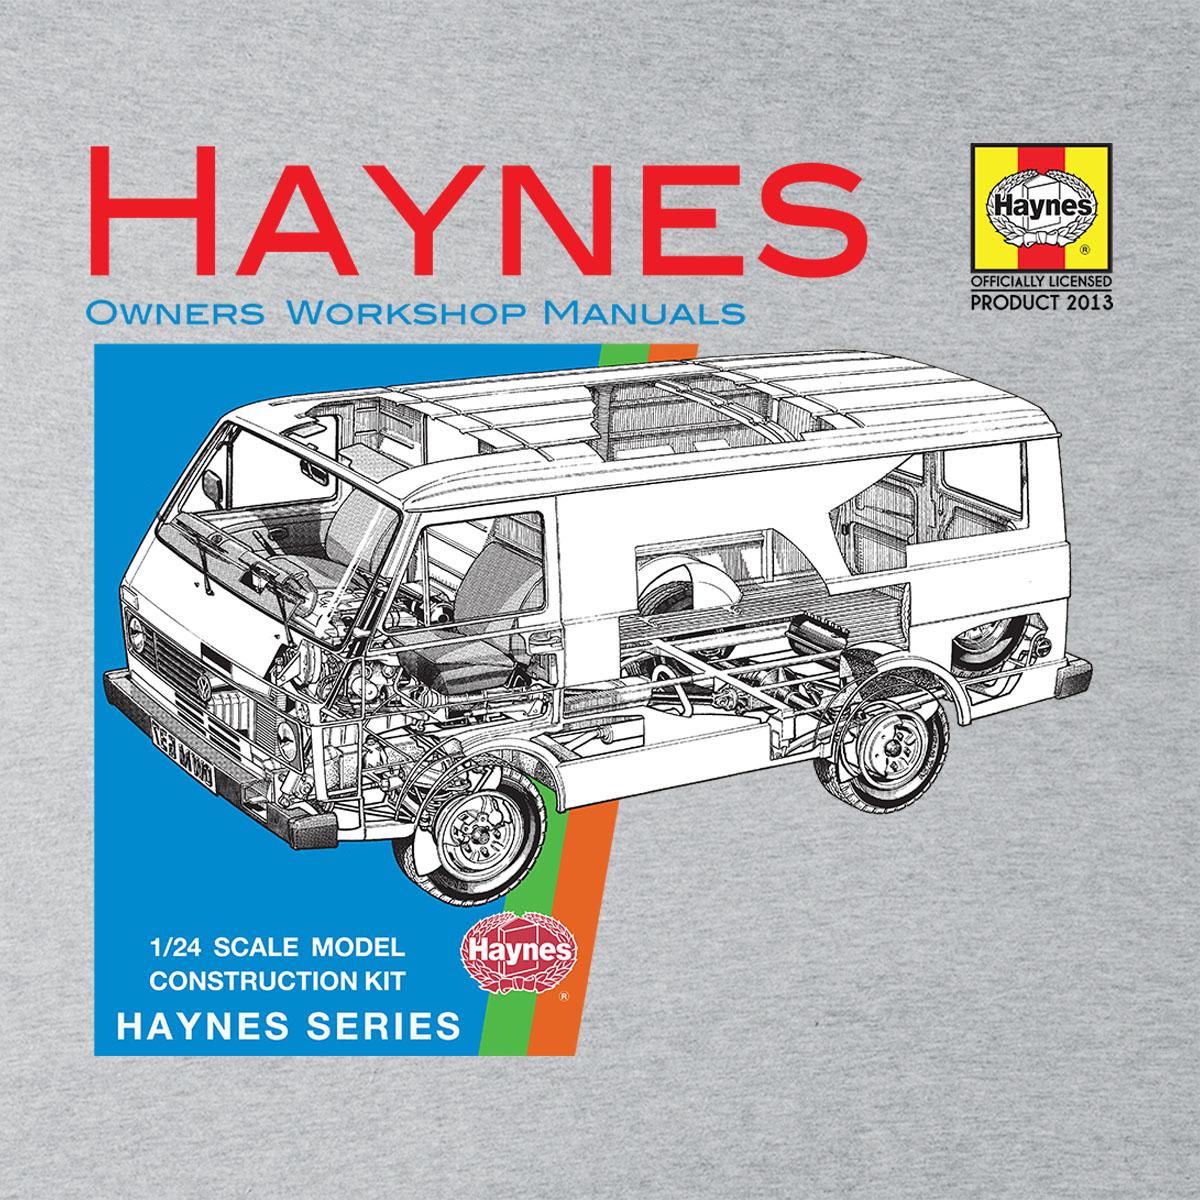 haynes owners workshop manual 0637 vw lt van women s sweatshirt ebay rh ebay co uk vw lt 35 service manual download vw lt 35 service manual download